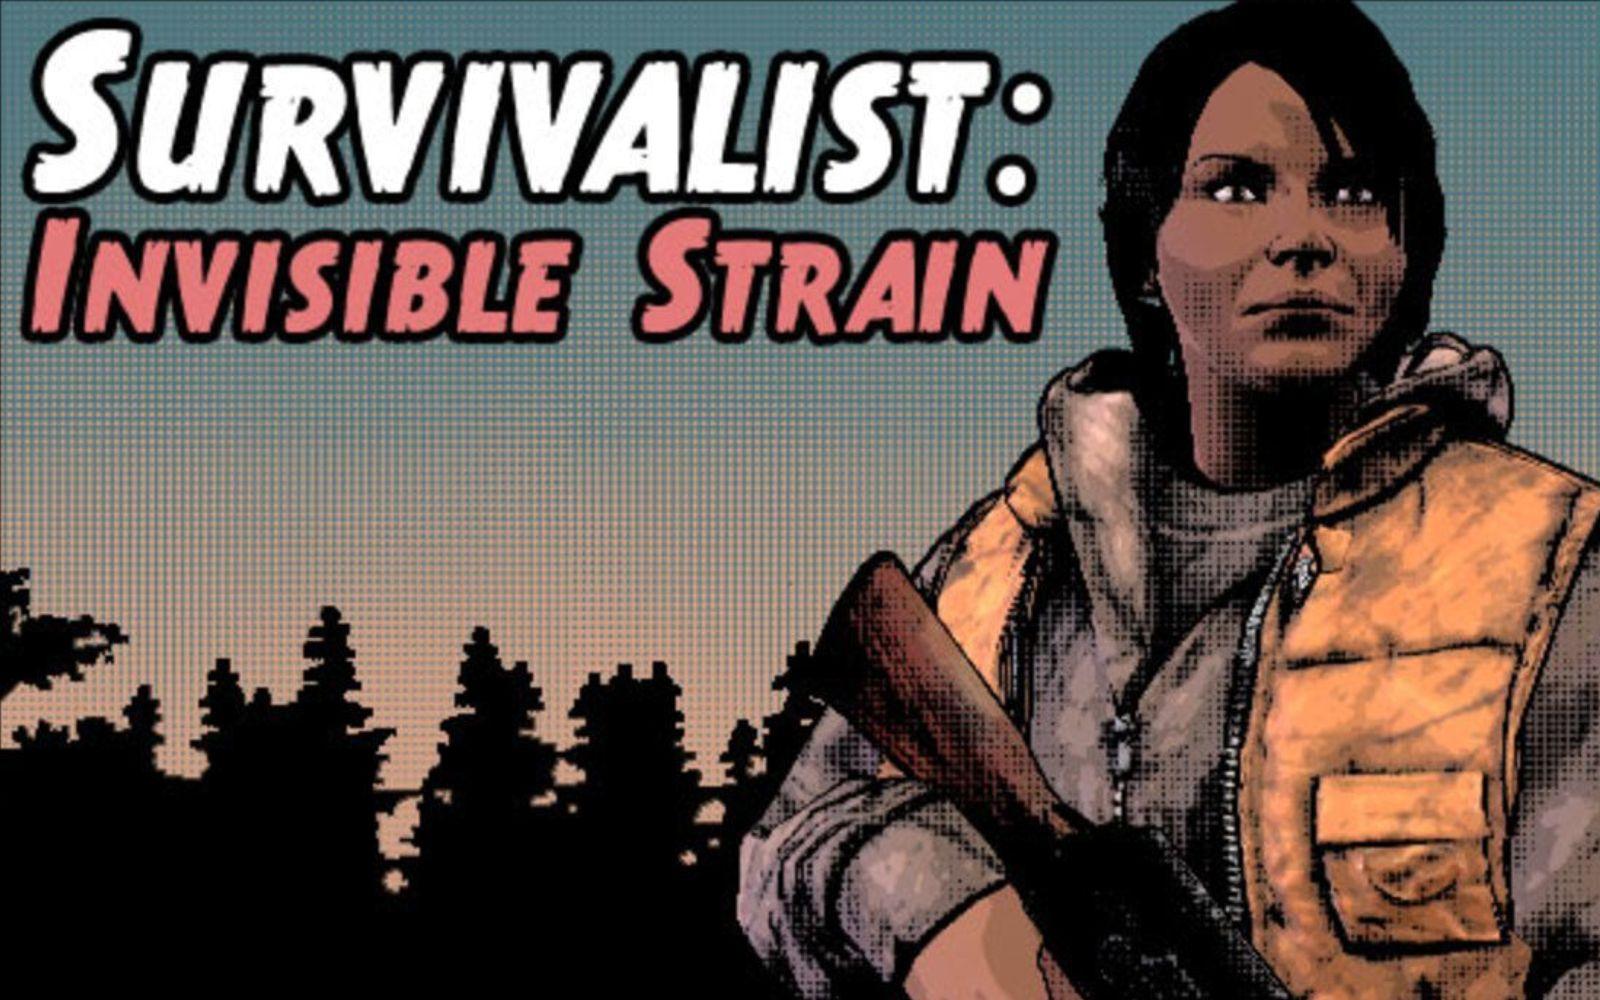 Elkészült: Survivalist - Invisible Strain